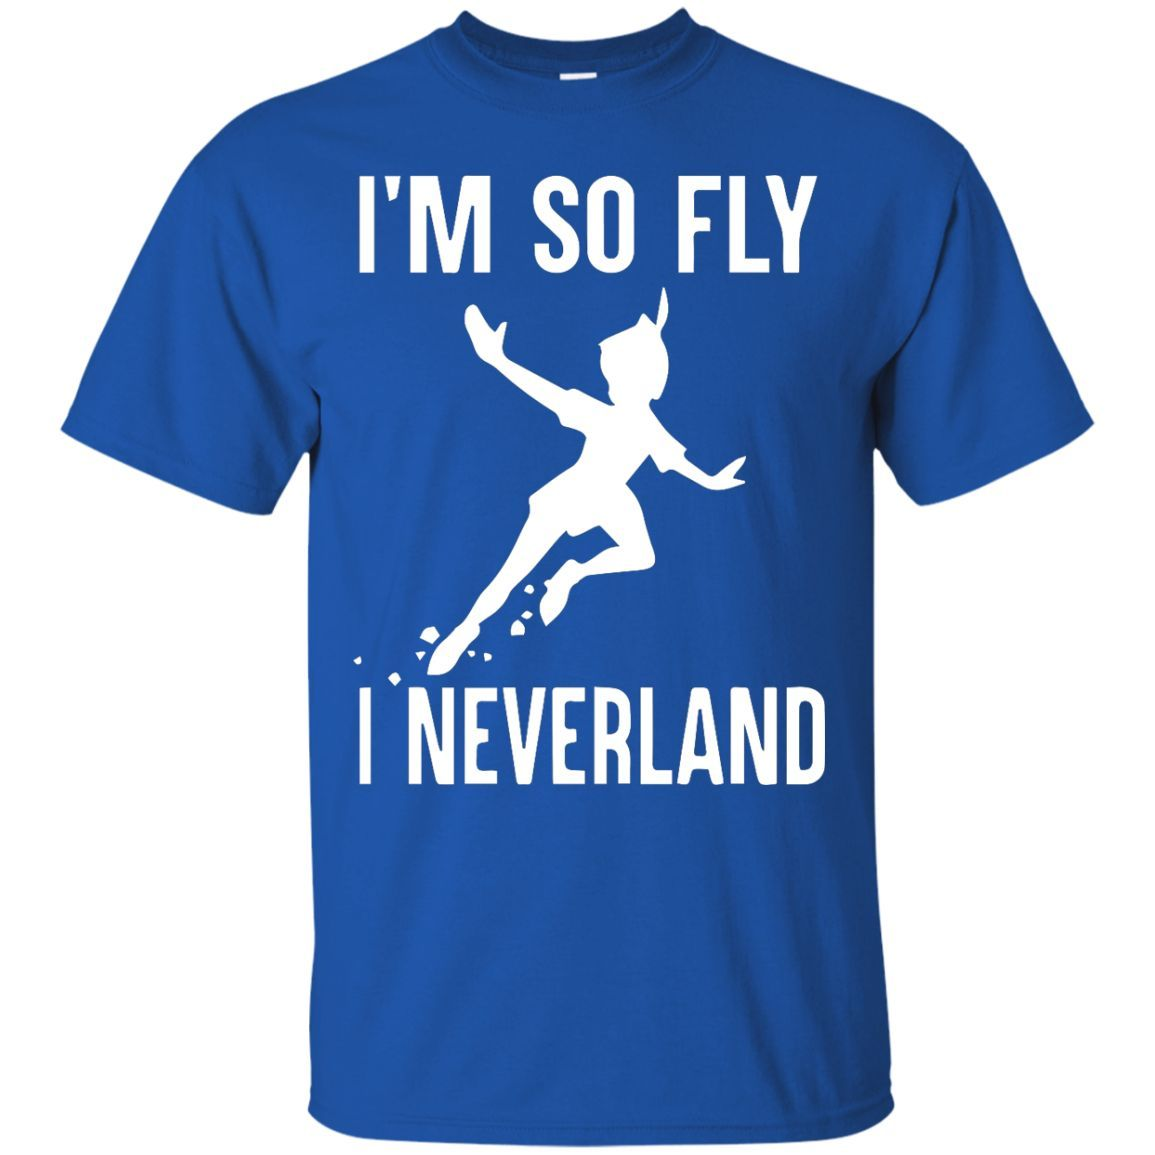 I'm so fly I neverland T-Shirt